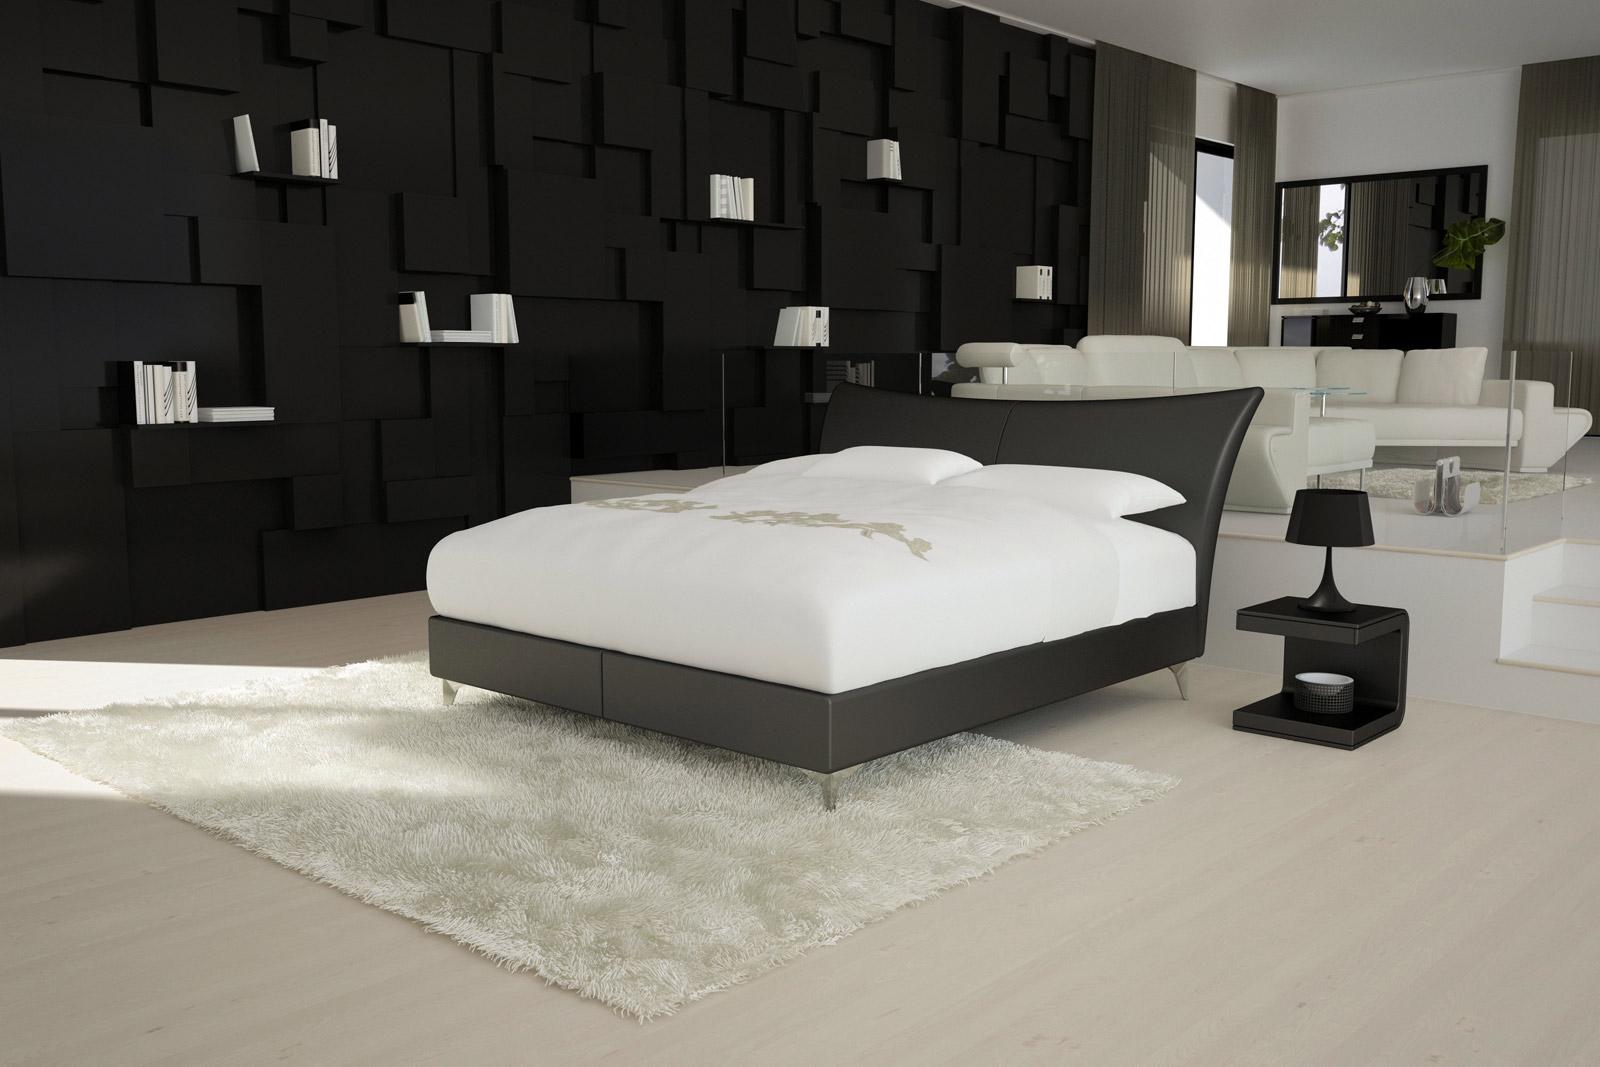 sam design boxspringbett 140 x 200 cm schwarz wing luciano. Black Bedroom Furniture Sets. Home Design Ideas